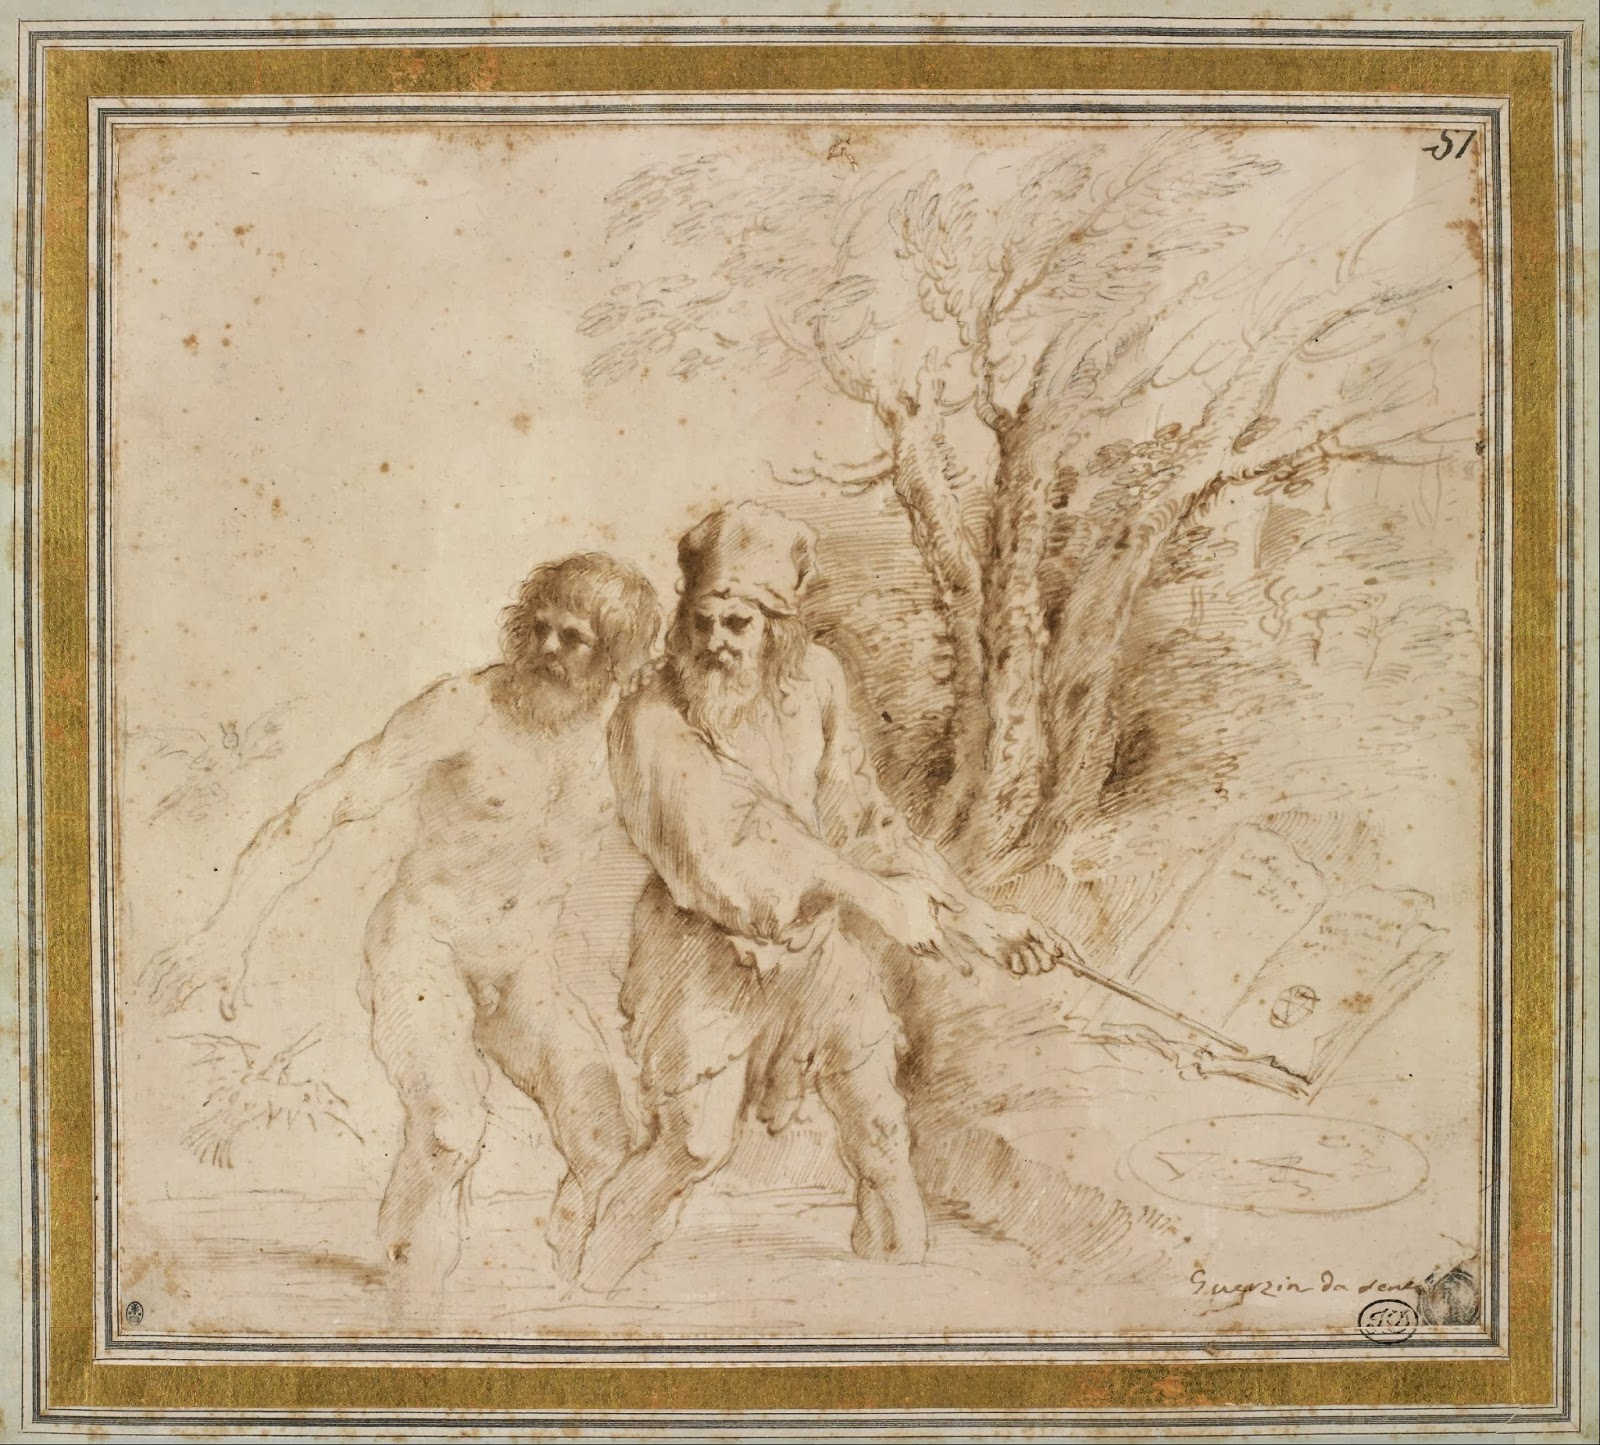 http://upload.wikimedia.org/wikipedia/commons/9/9d/Guercino_%28Giovanni_Francesco_Barbieri%29_-_An_Astrological_Subject_-_Google_Art_Project.jpg